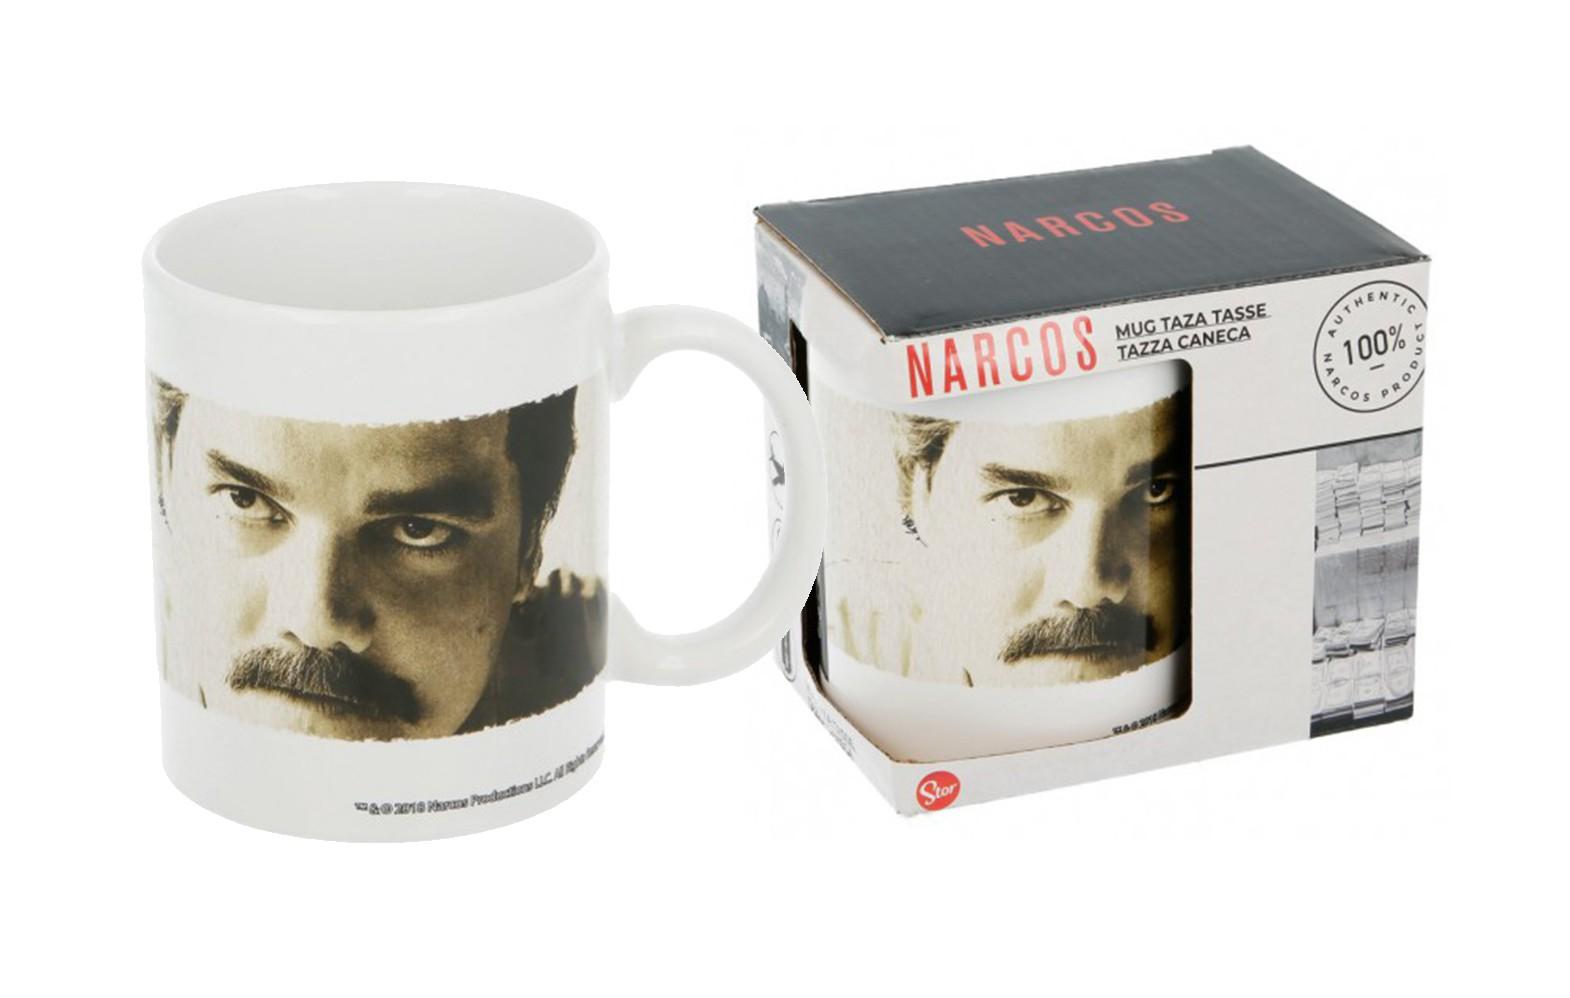 Narcos Pablo Escobar puodukas